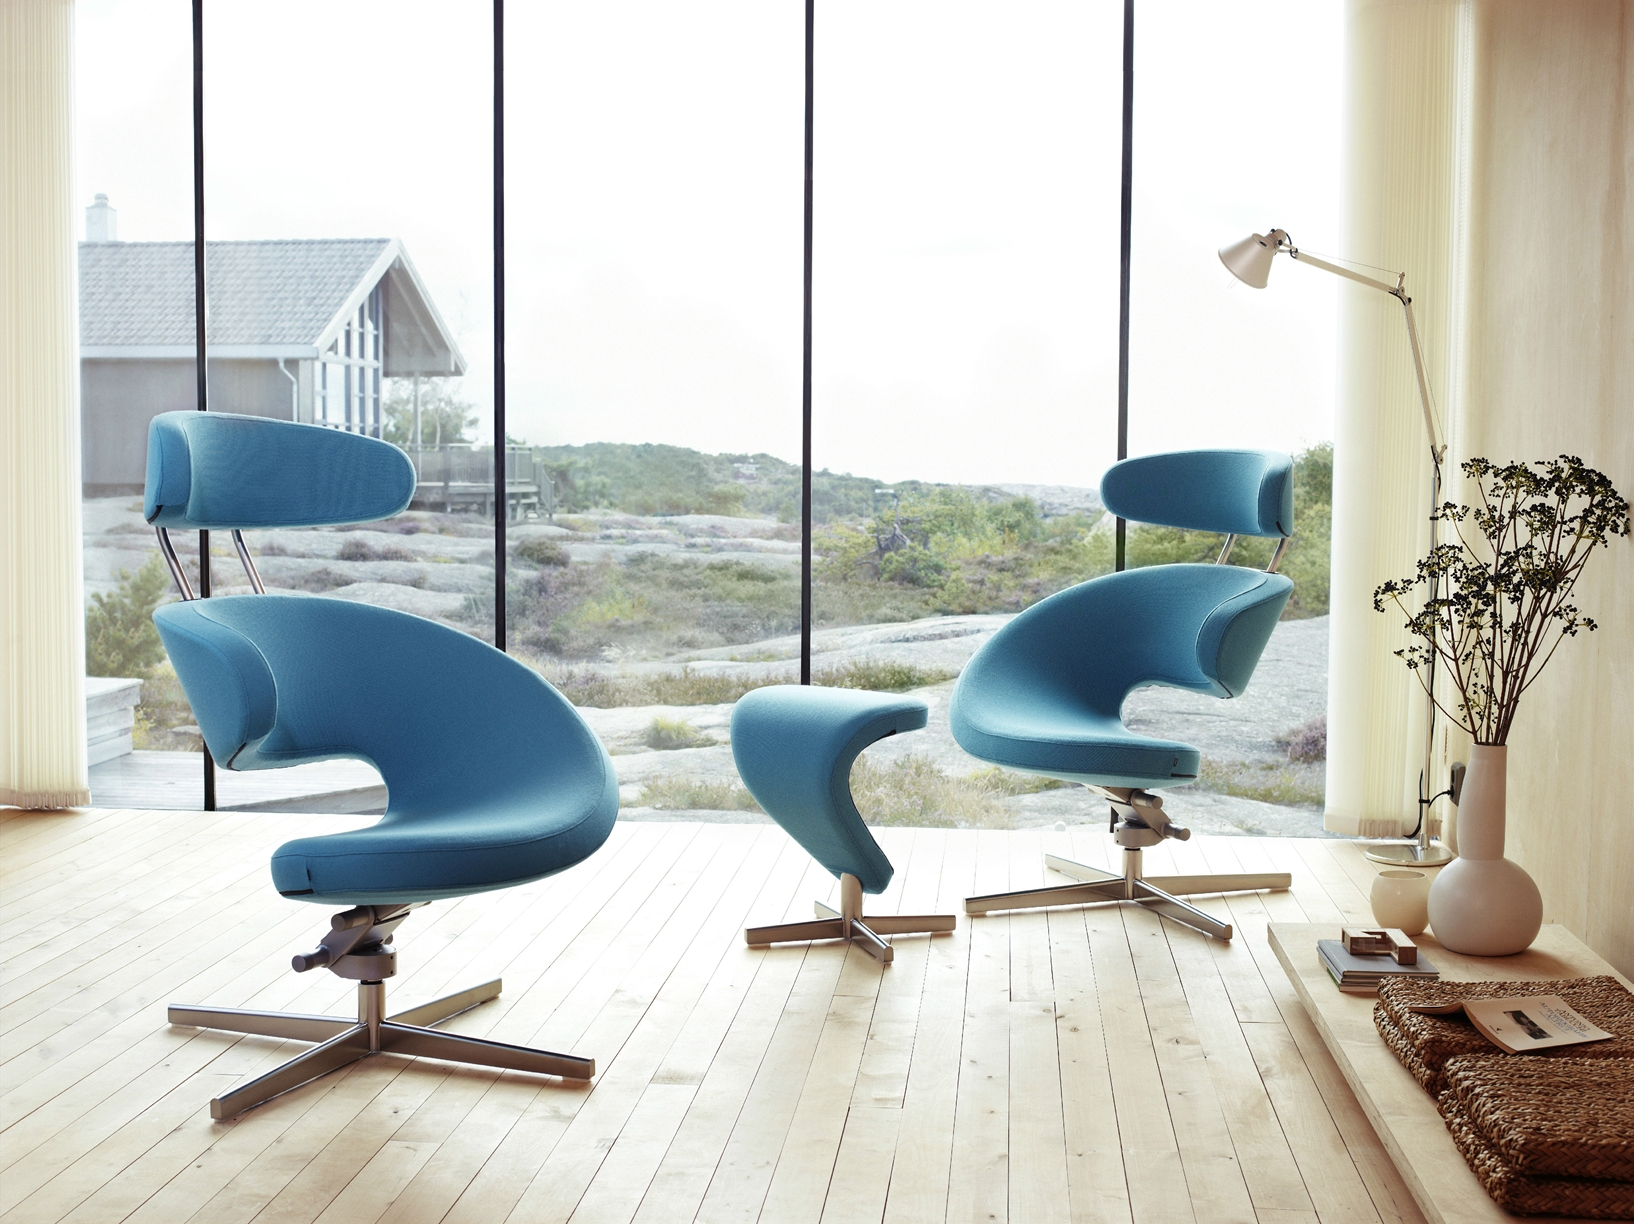 il design norvegese protagonista ai saloni 2013. Black Bedroom Furniture Sets. Home Design Ideas